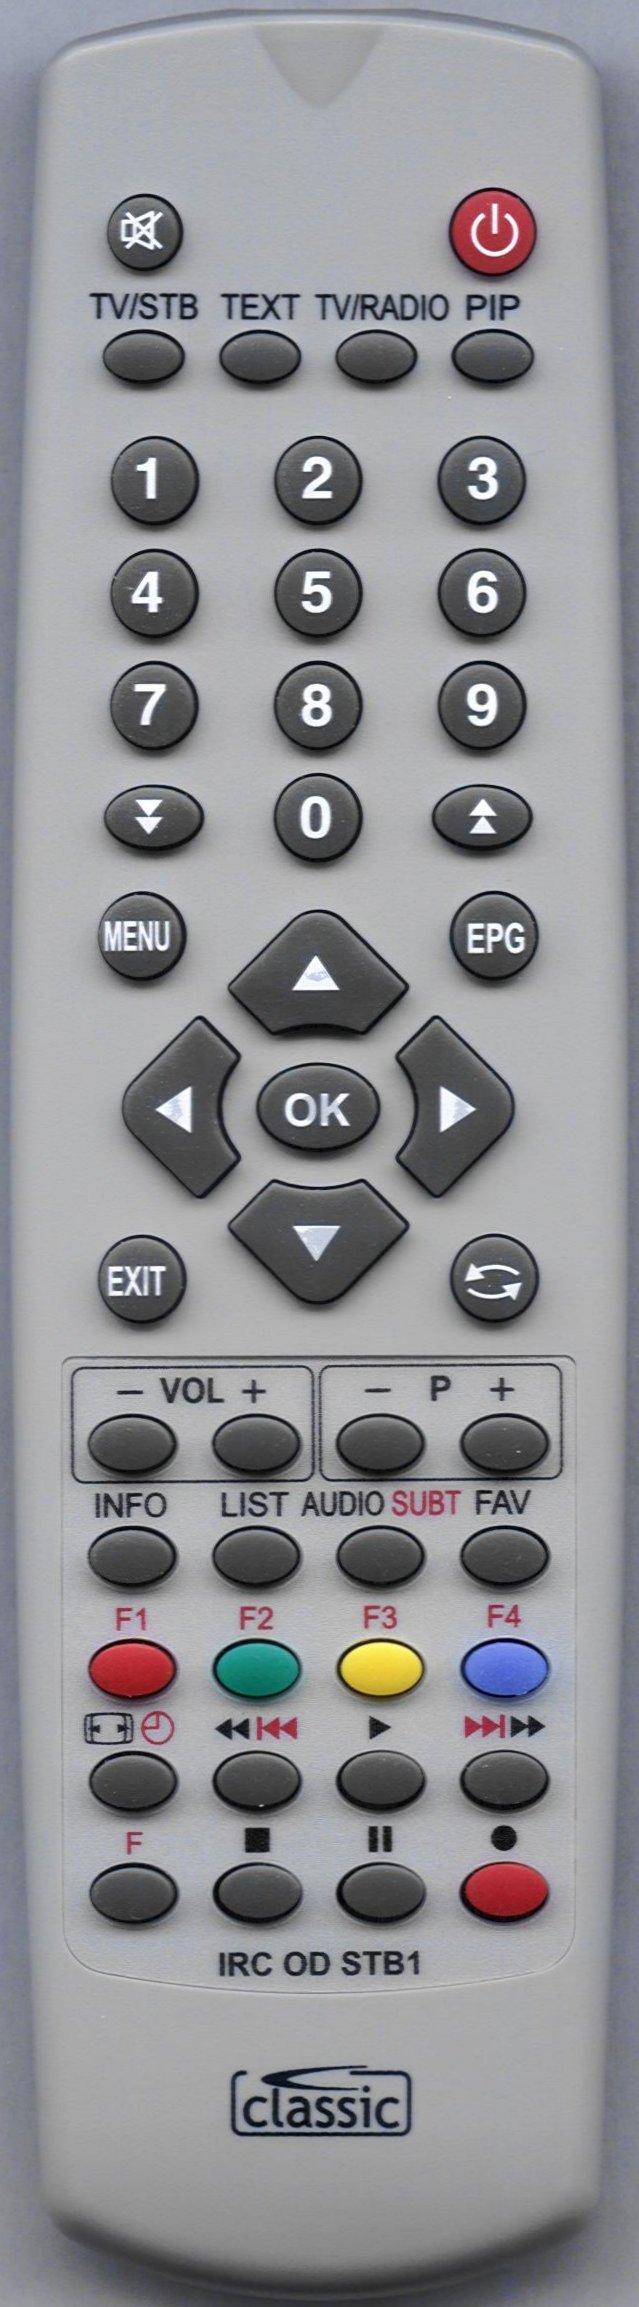 TOPFIELD TF 5100PVR Remote Control Alternative